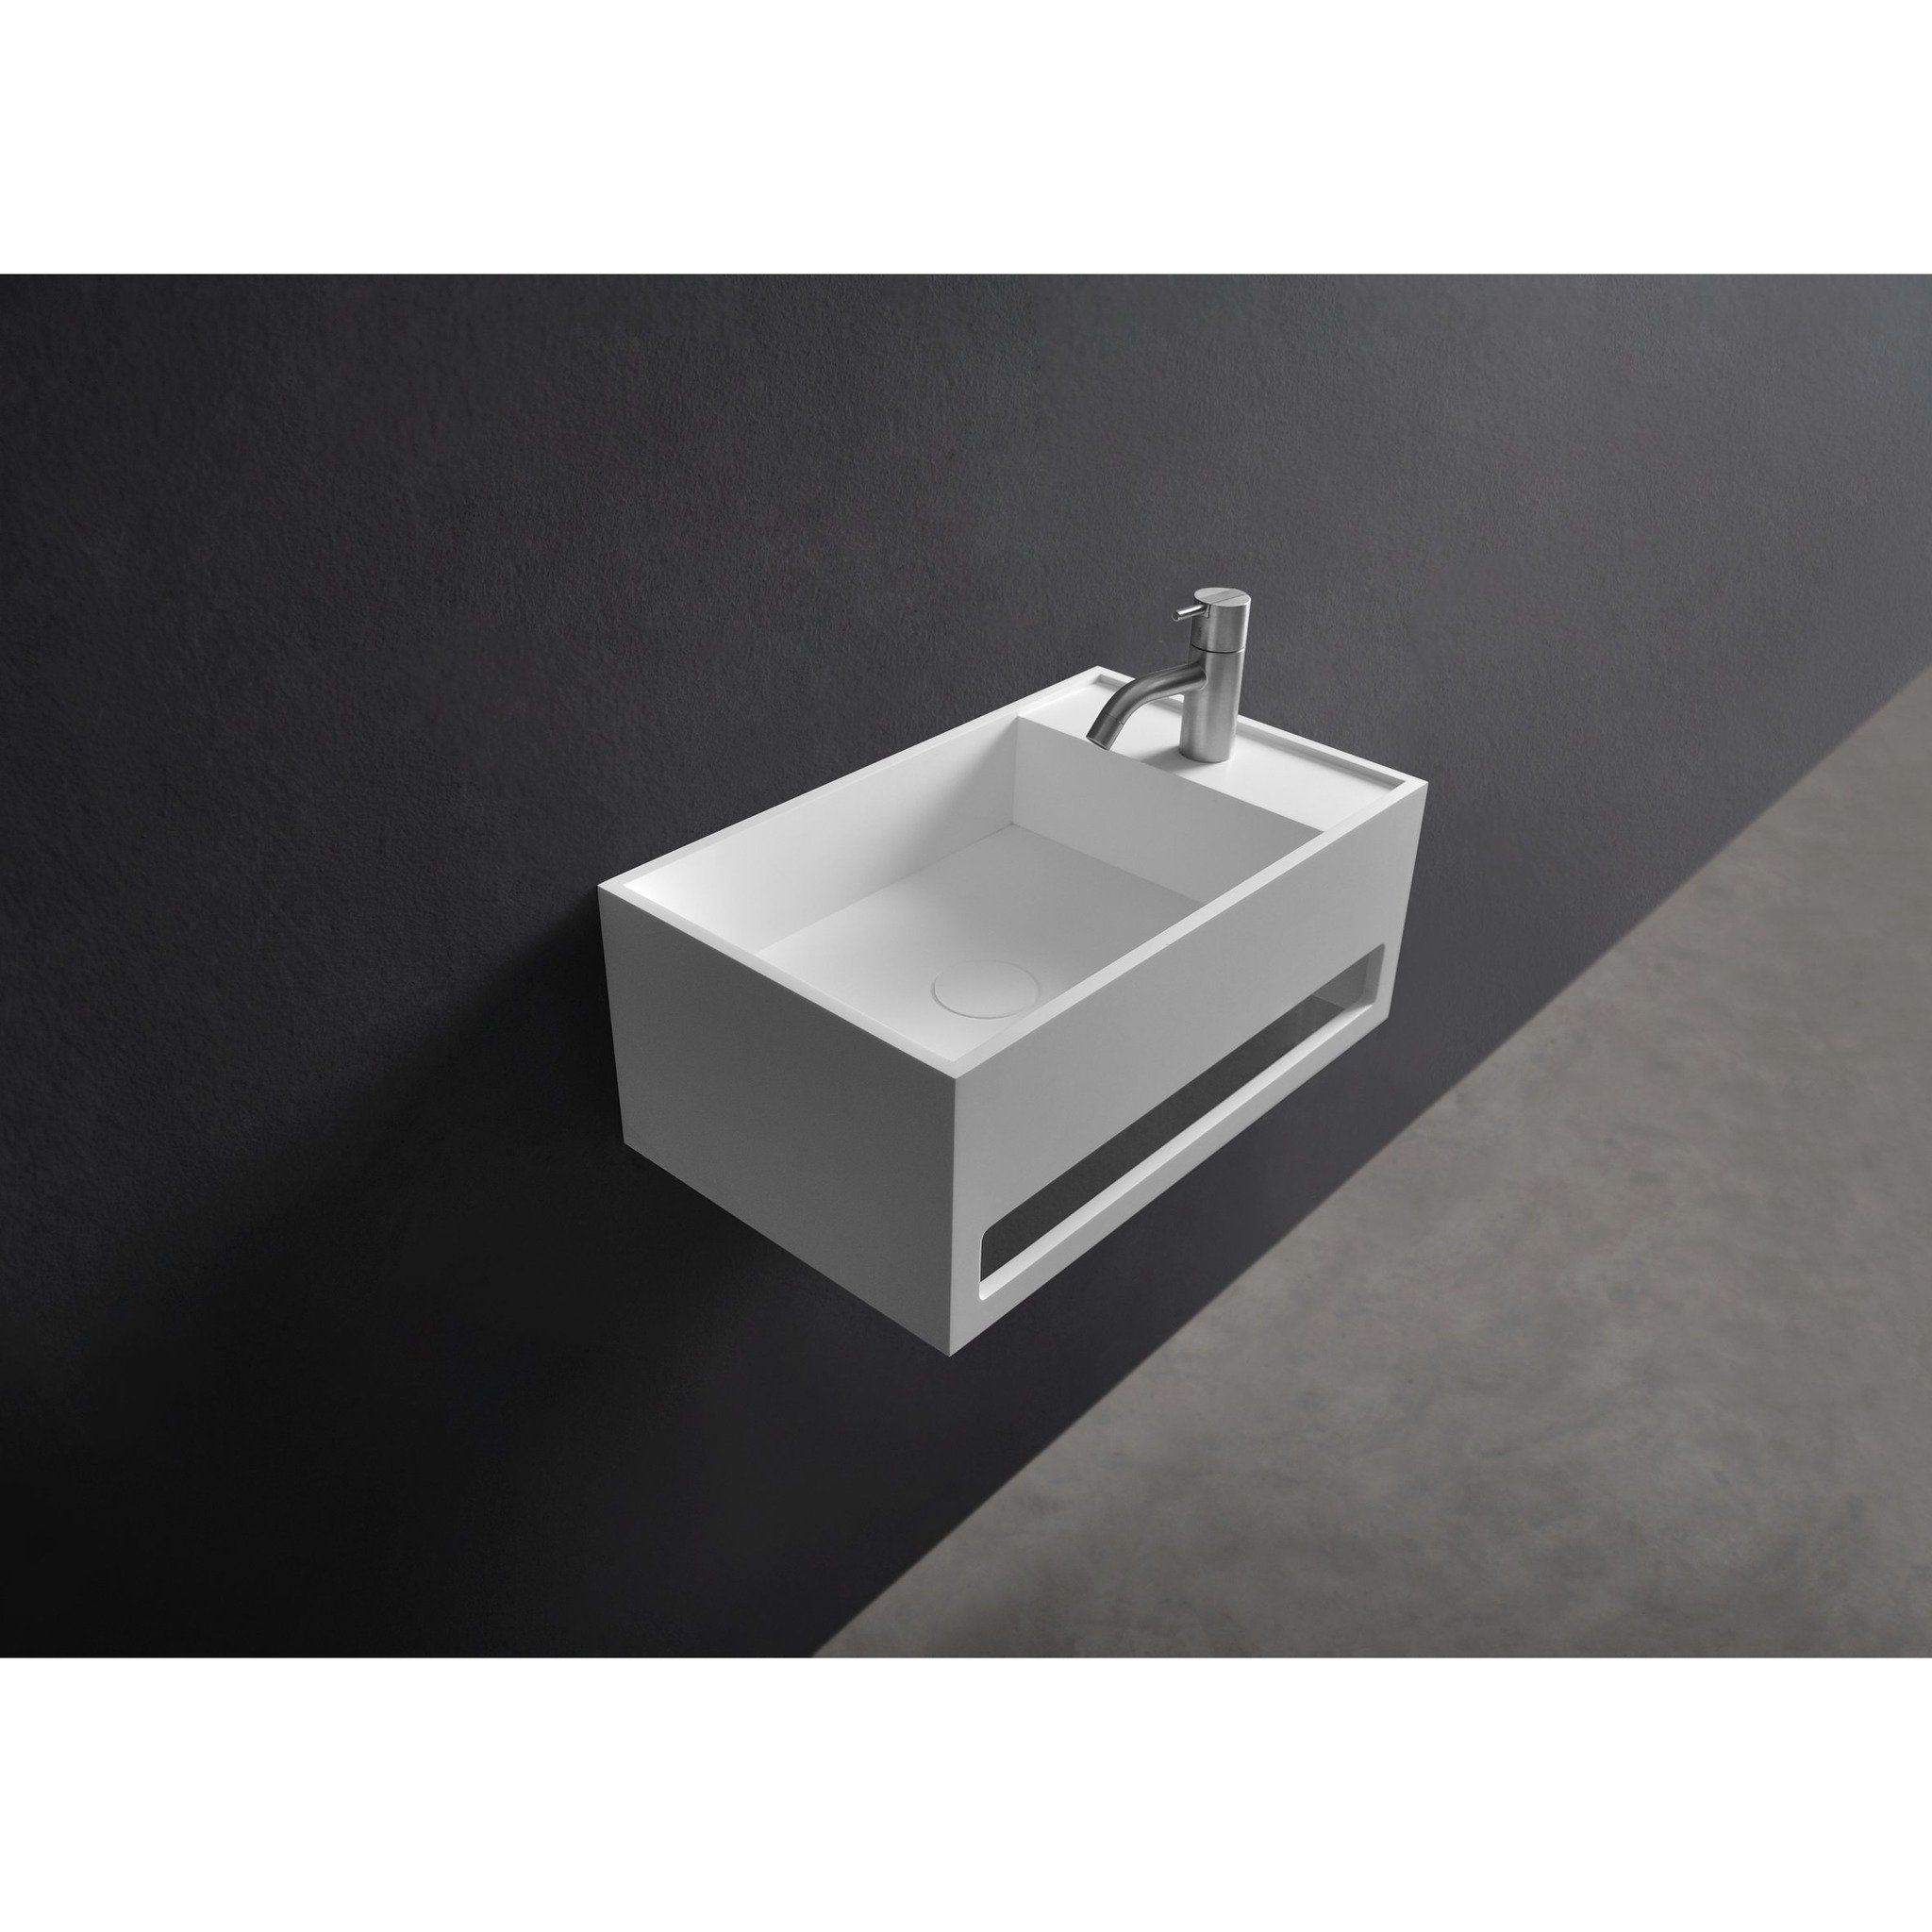 Ideavit Solid Surface toiletfontein wastafel Solidcube Badkamers